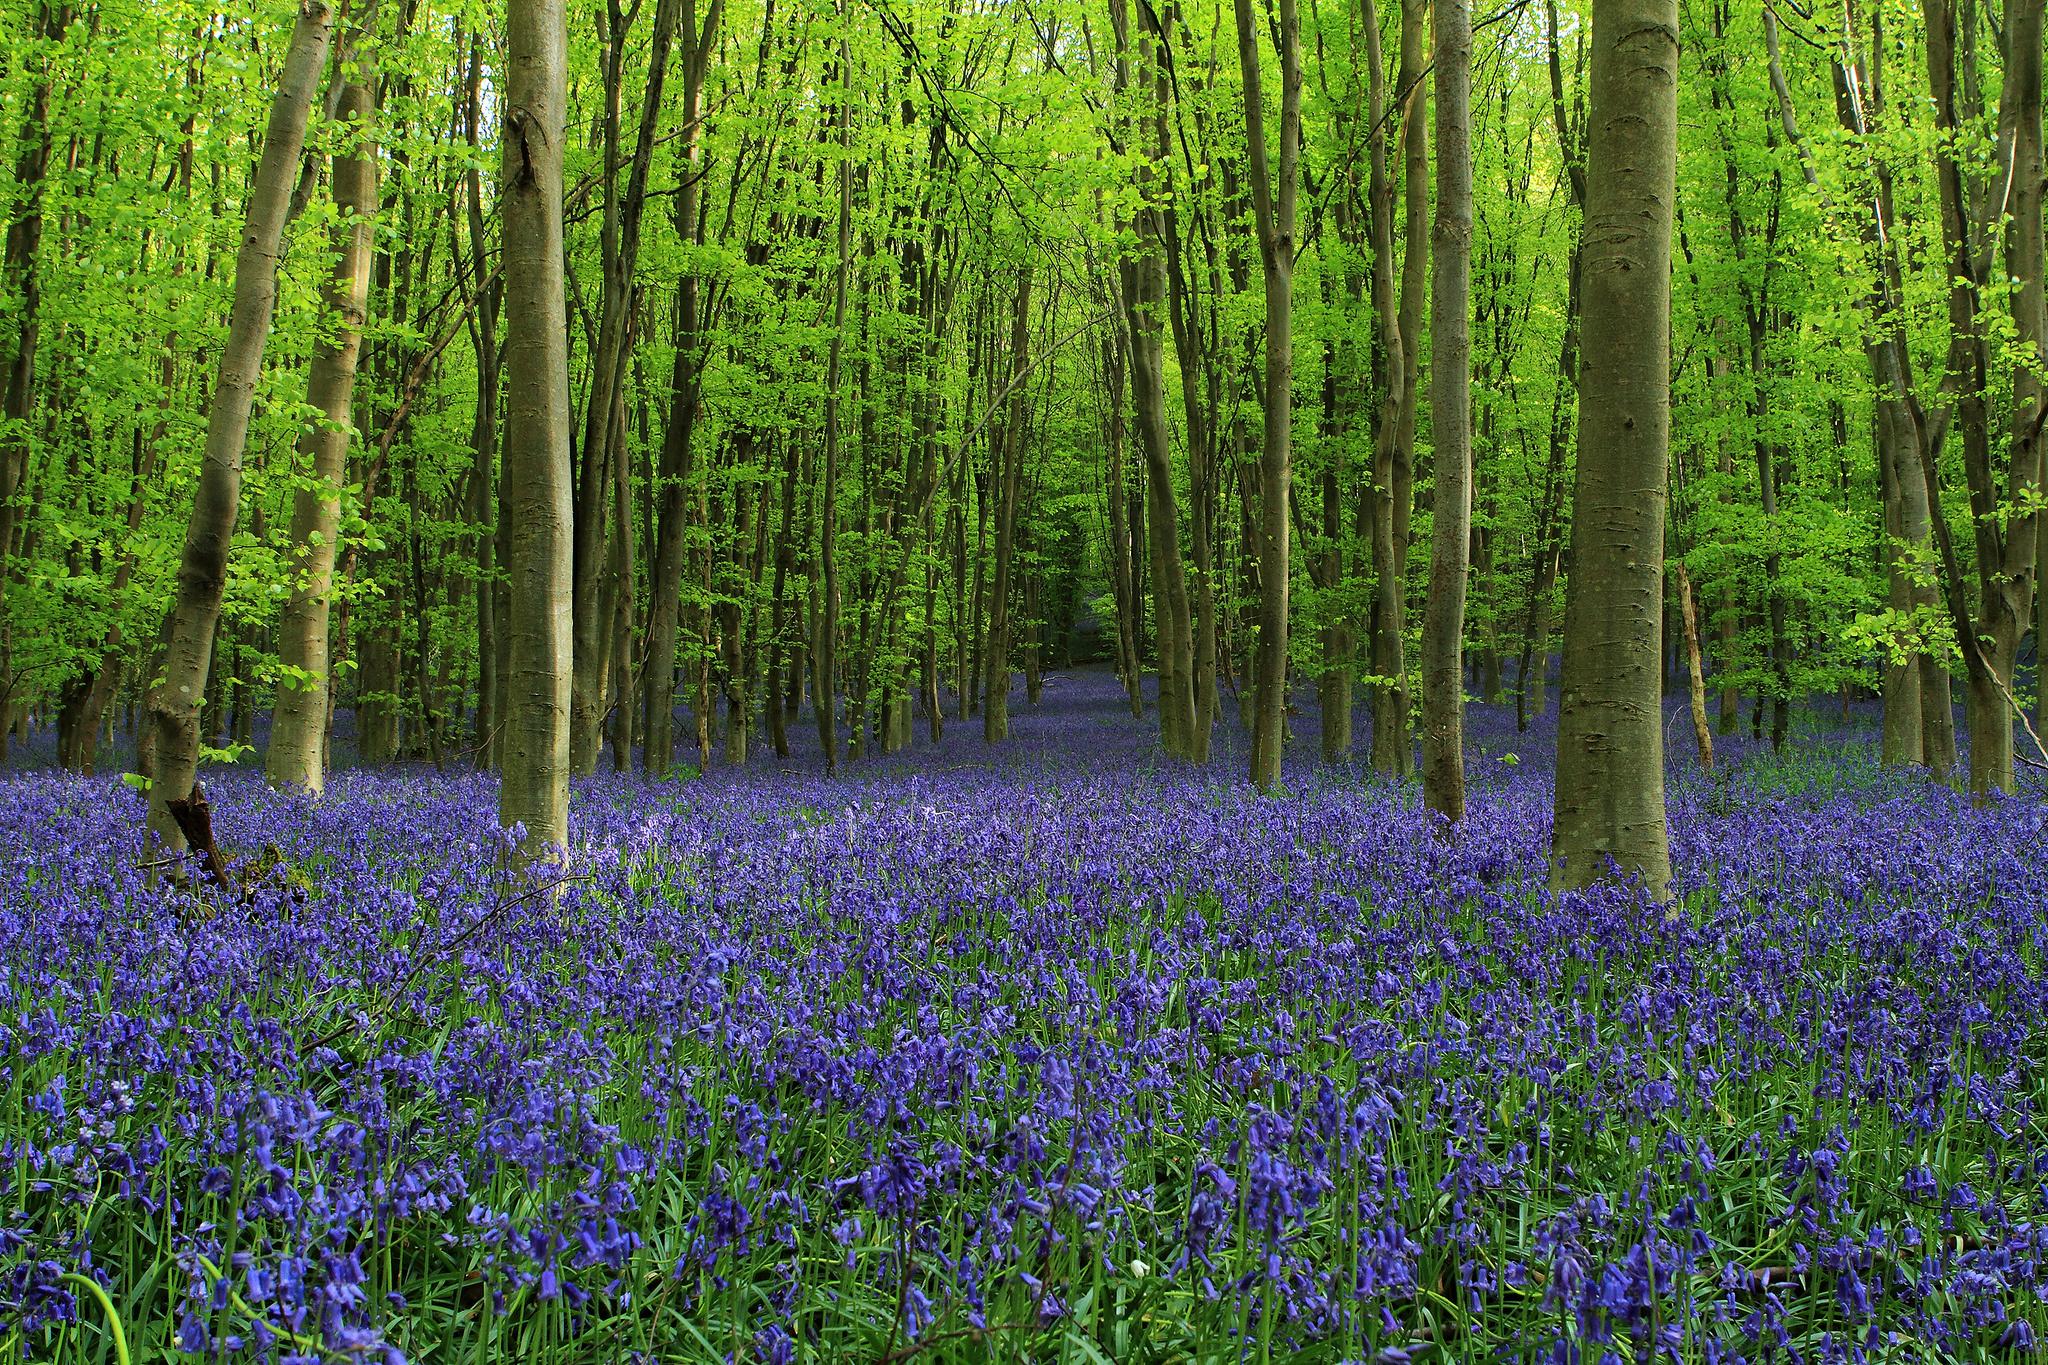 lavender field desktop background